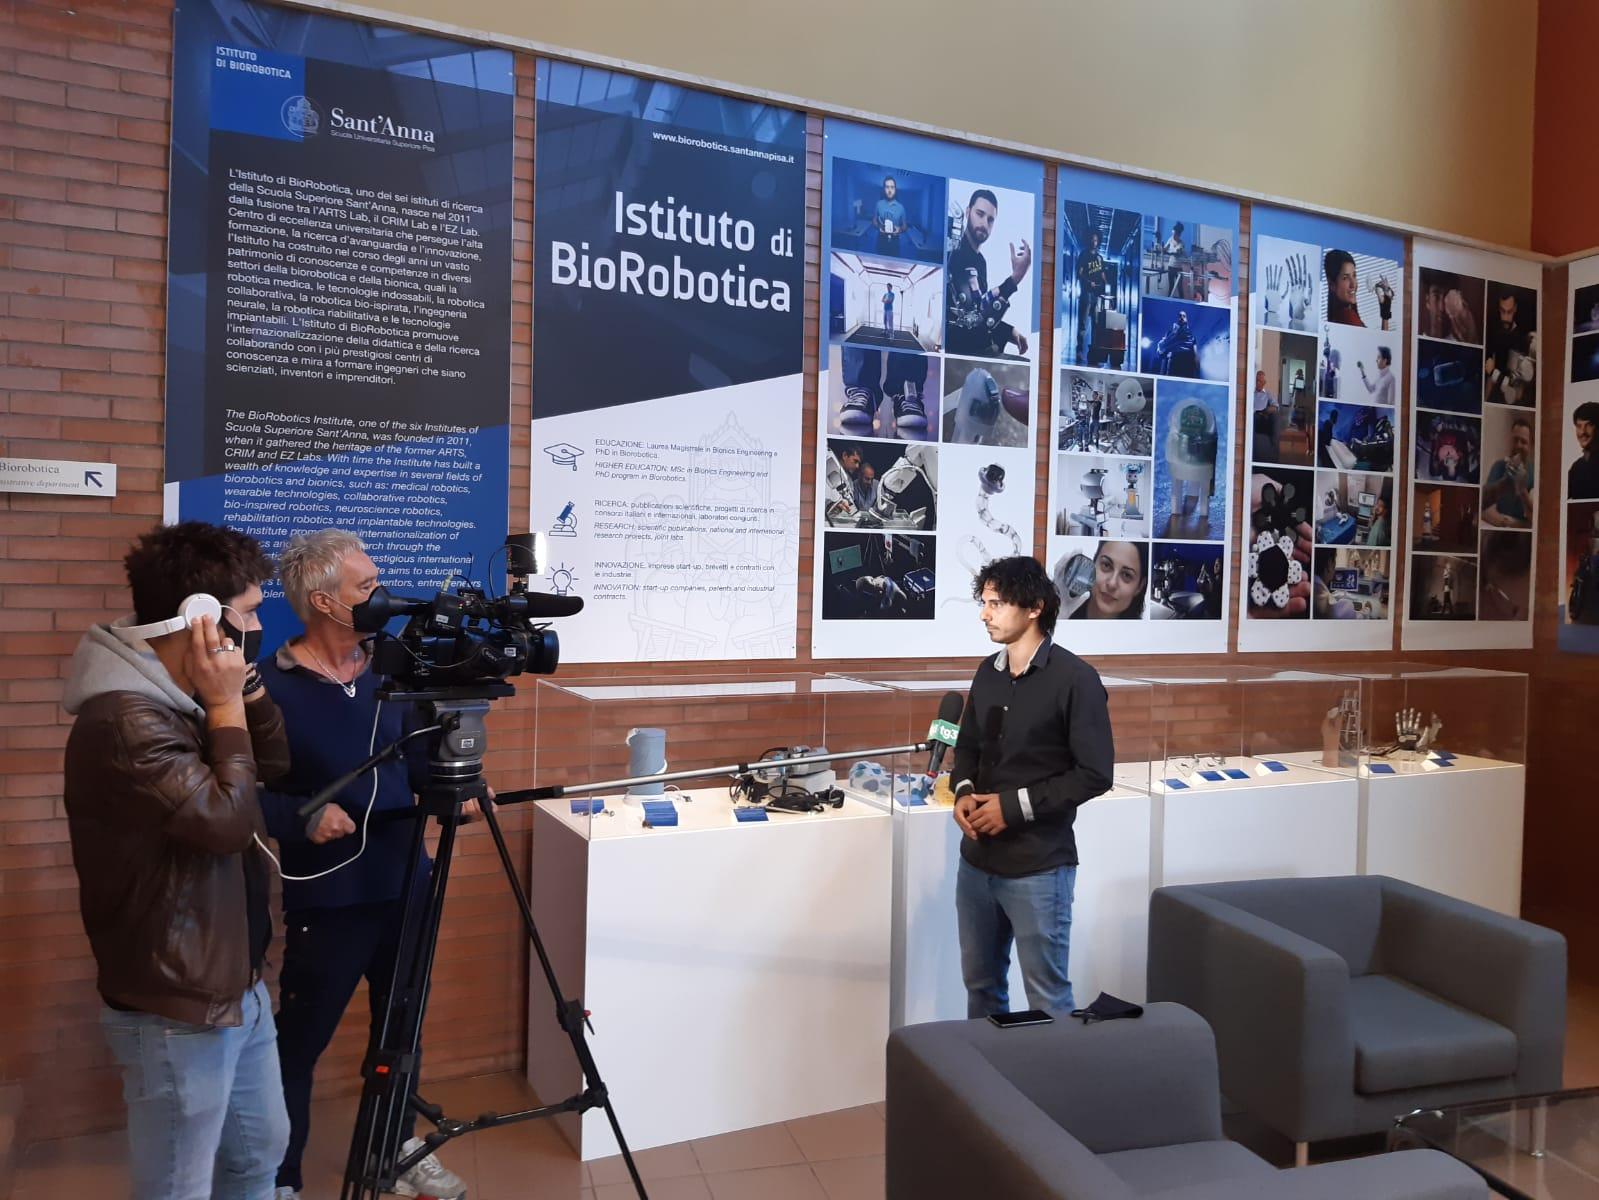 Press review: RAI (Italian State Broadcaster) interviews Leonardo Ricotti